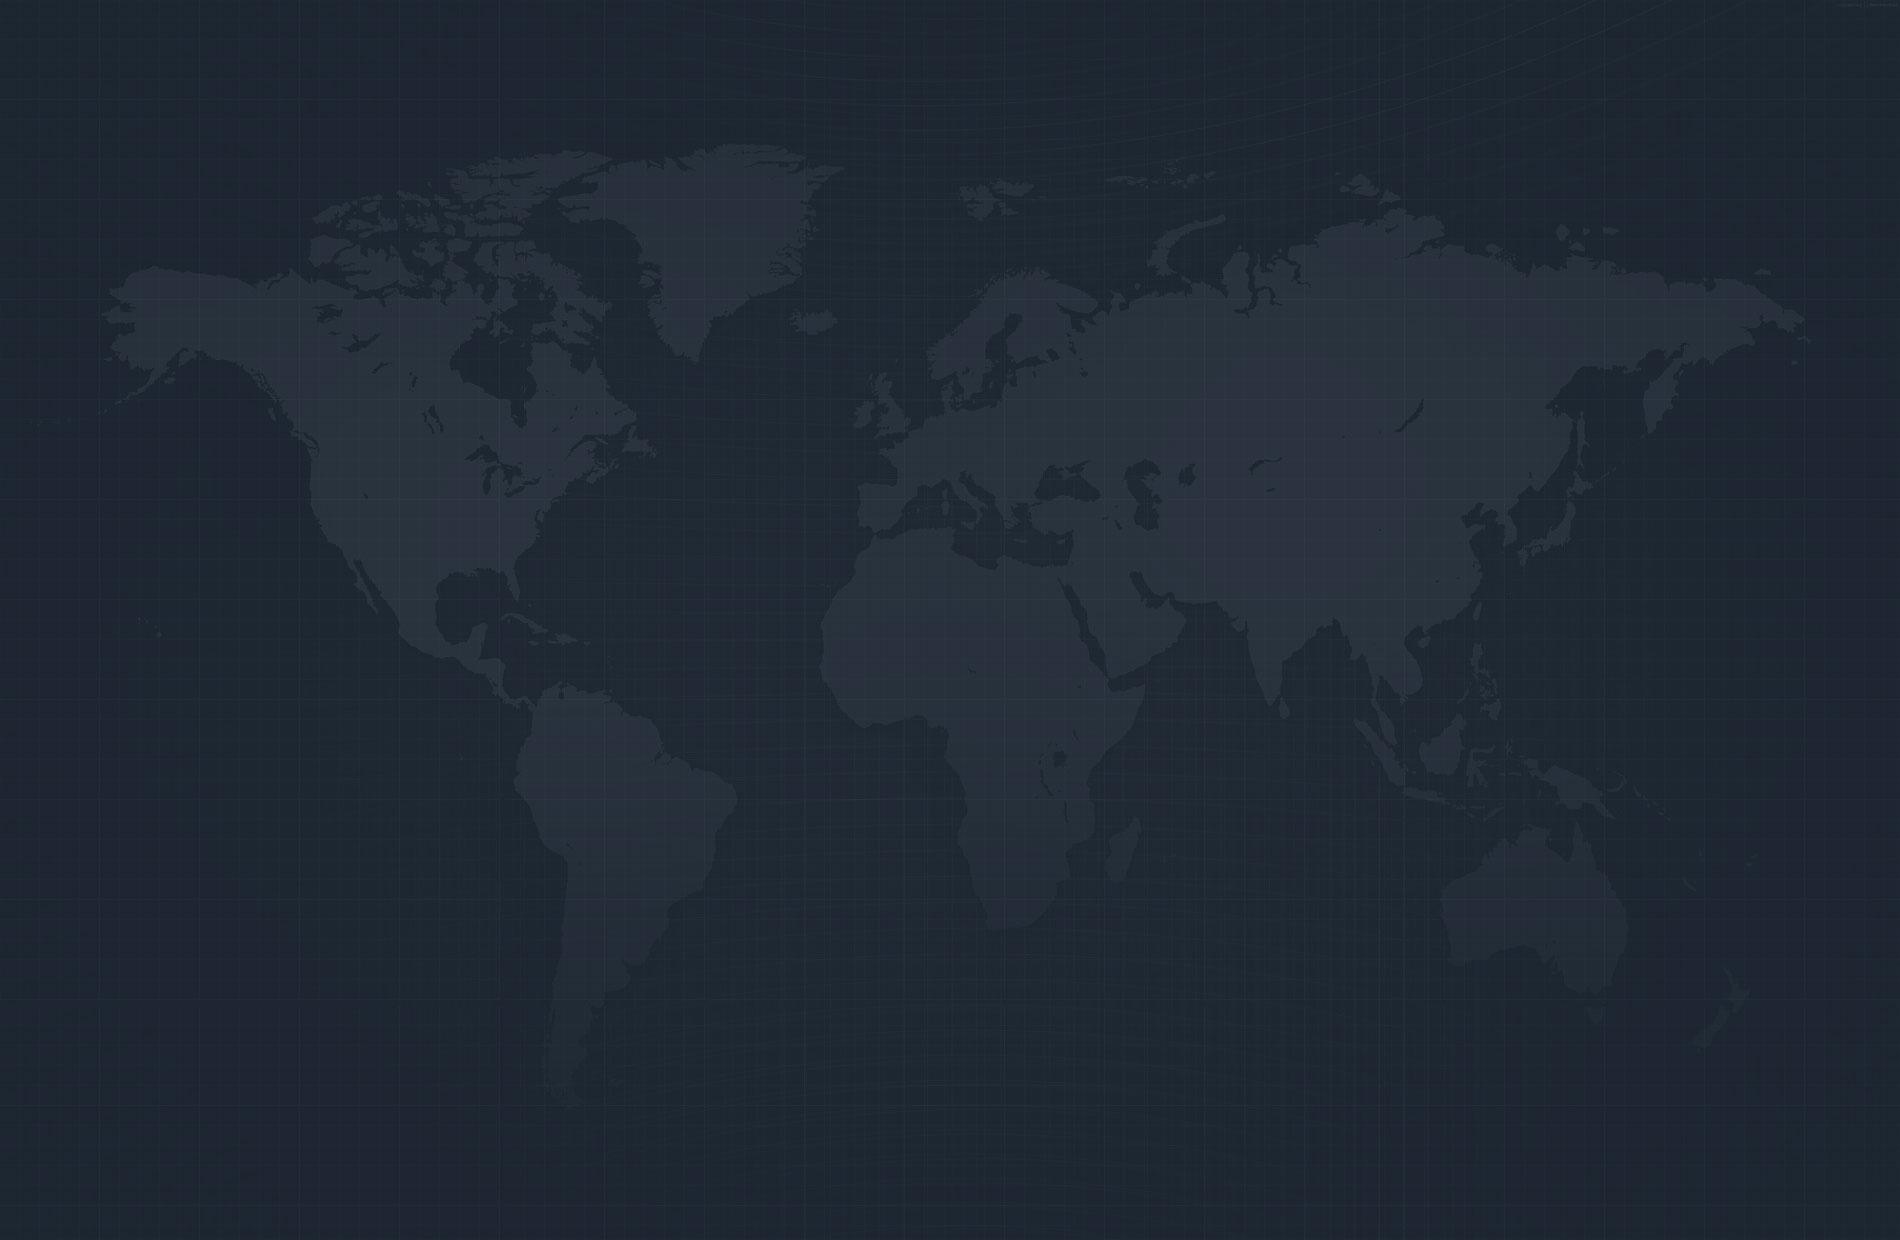 world map background dark   M3Sixty 1900x1240